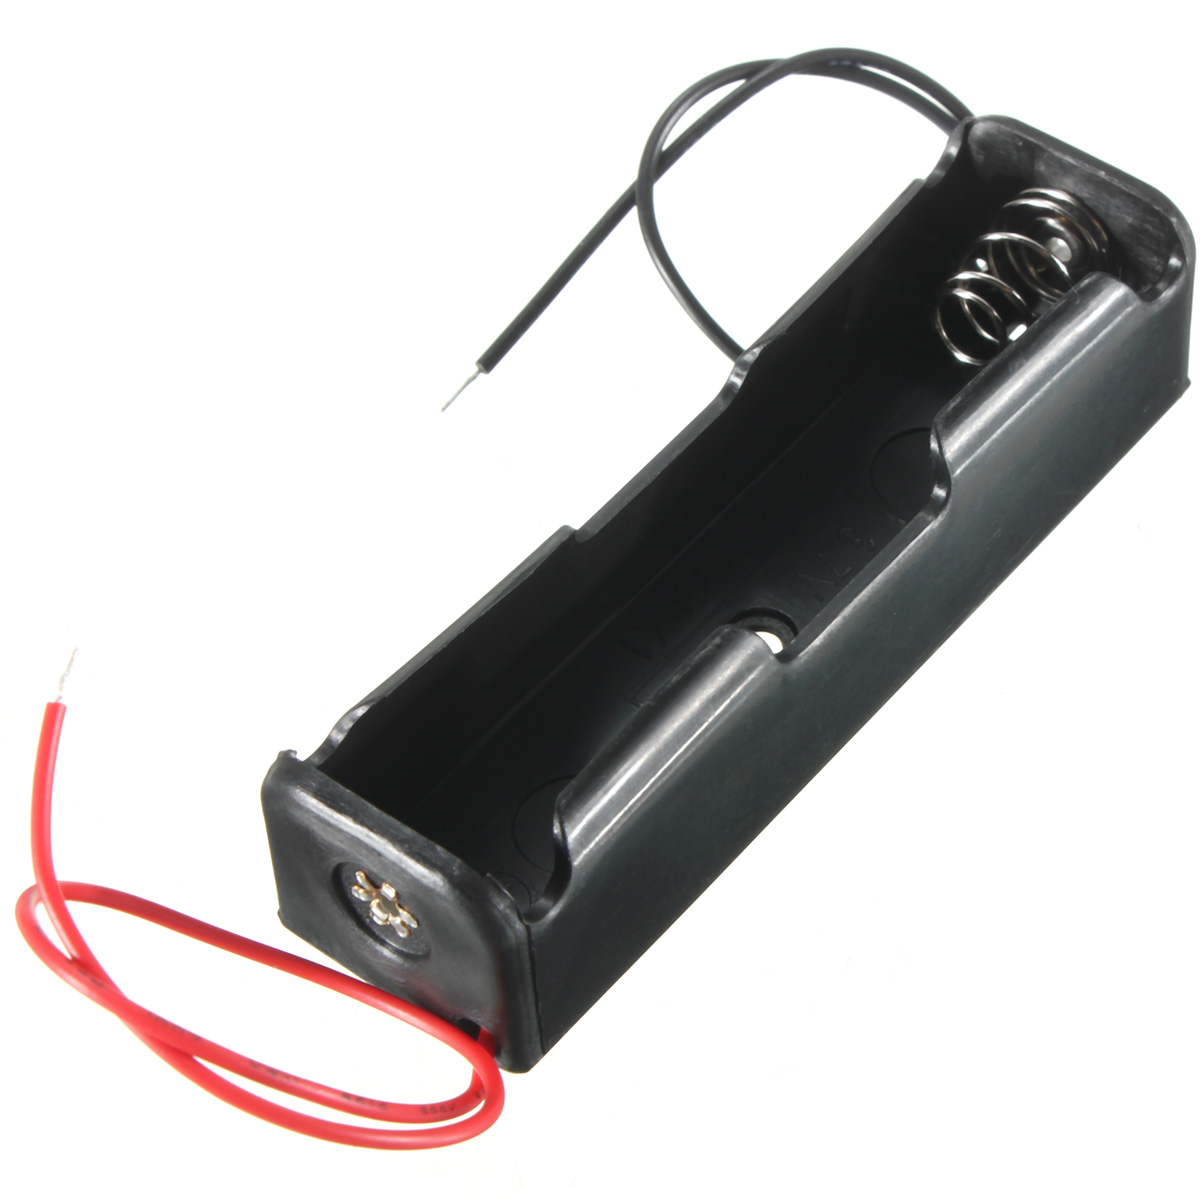 5pcs/lot 3.7V 18650 Battery Clip Holder Box Case Black With 4 Wire Lea